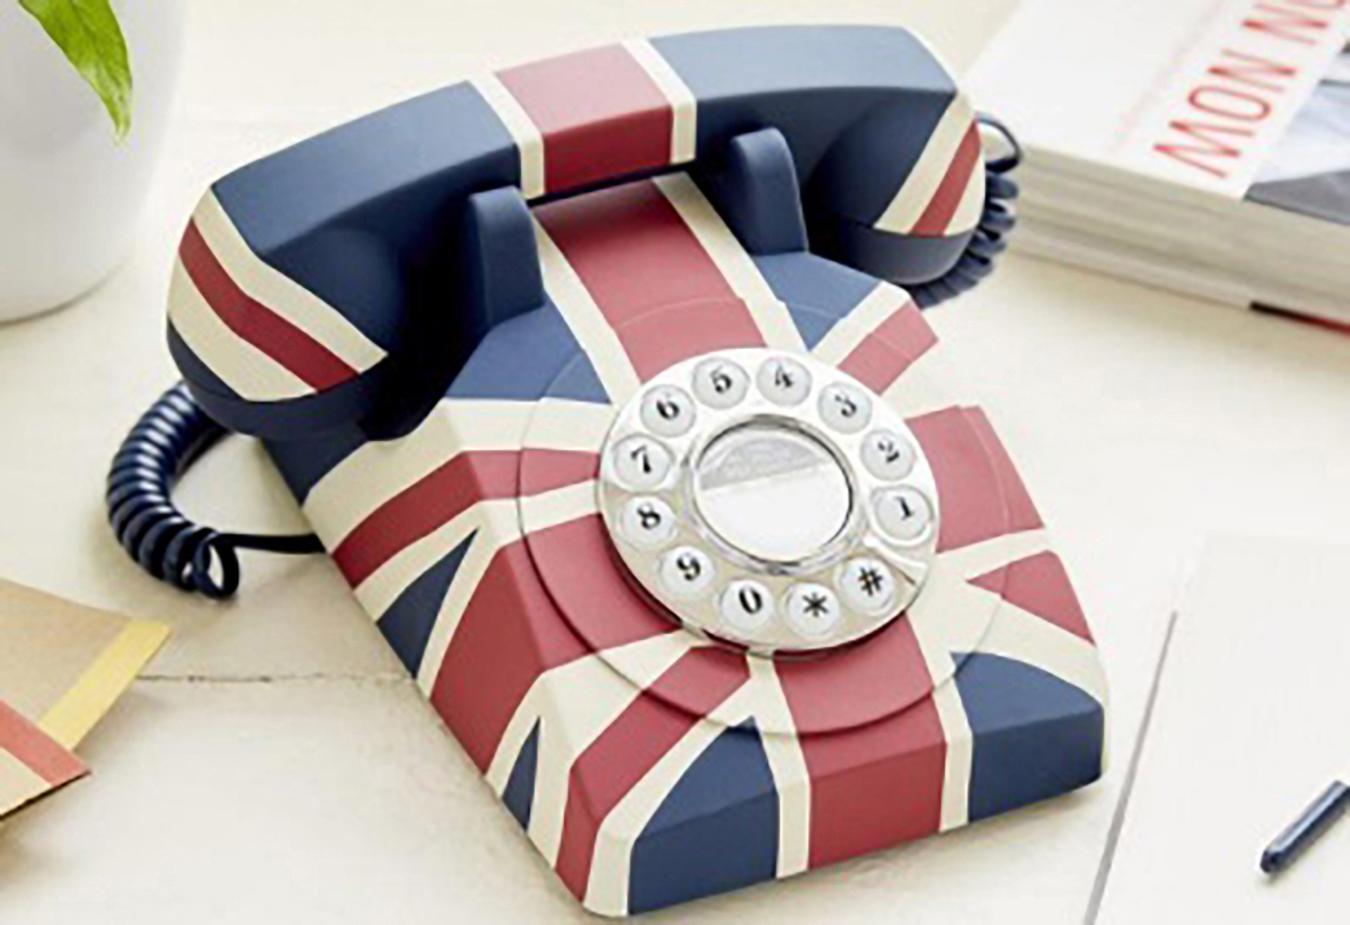 gpo-telefono-british